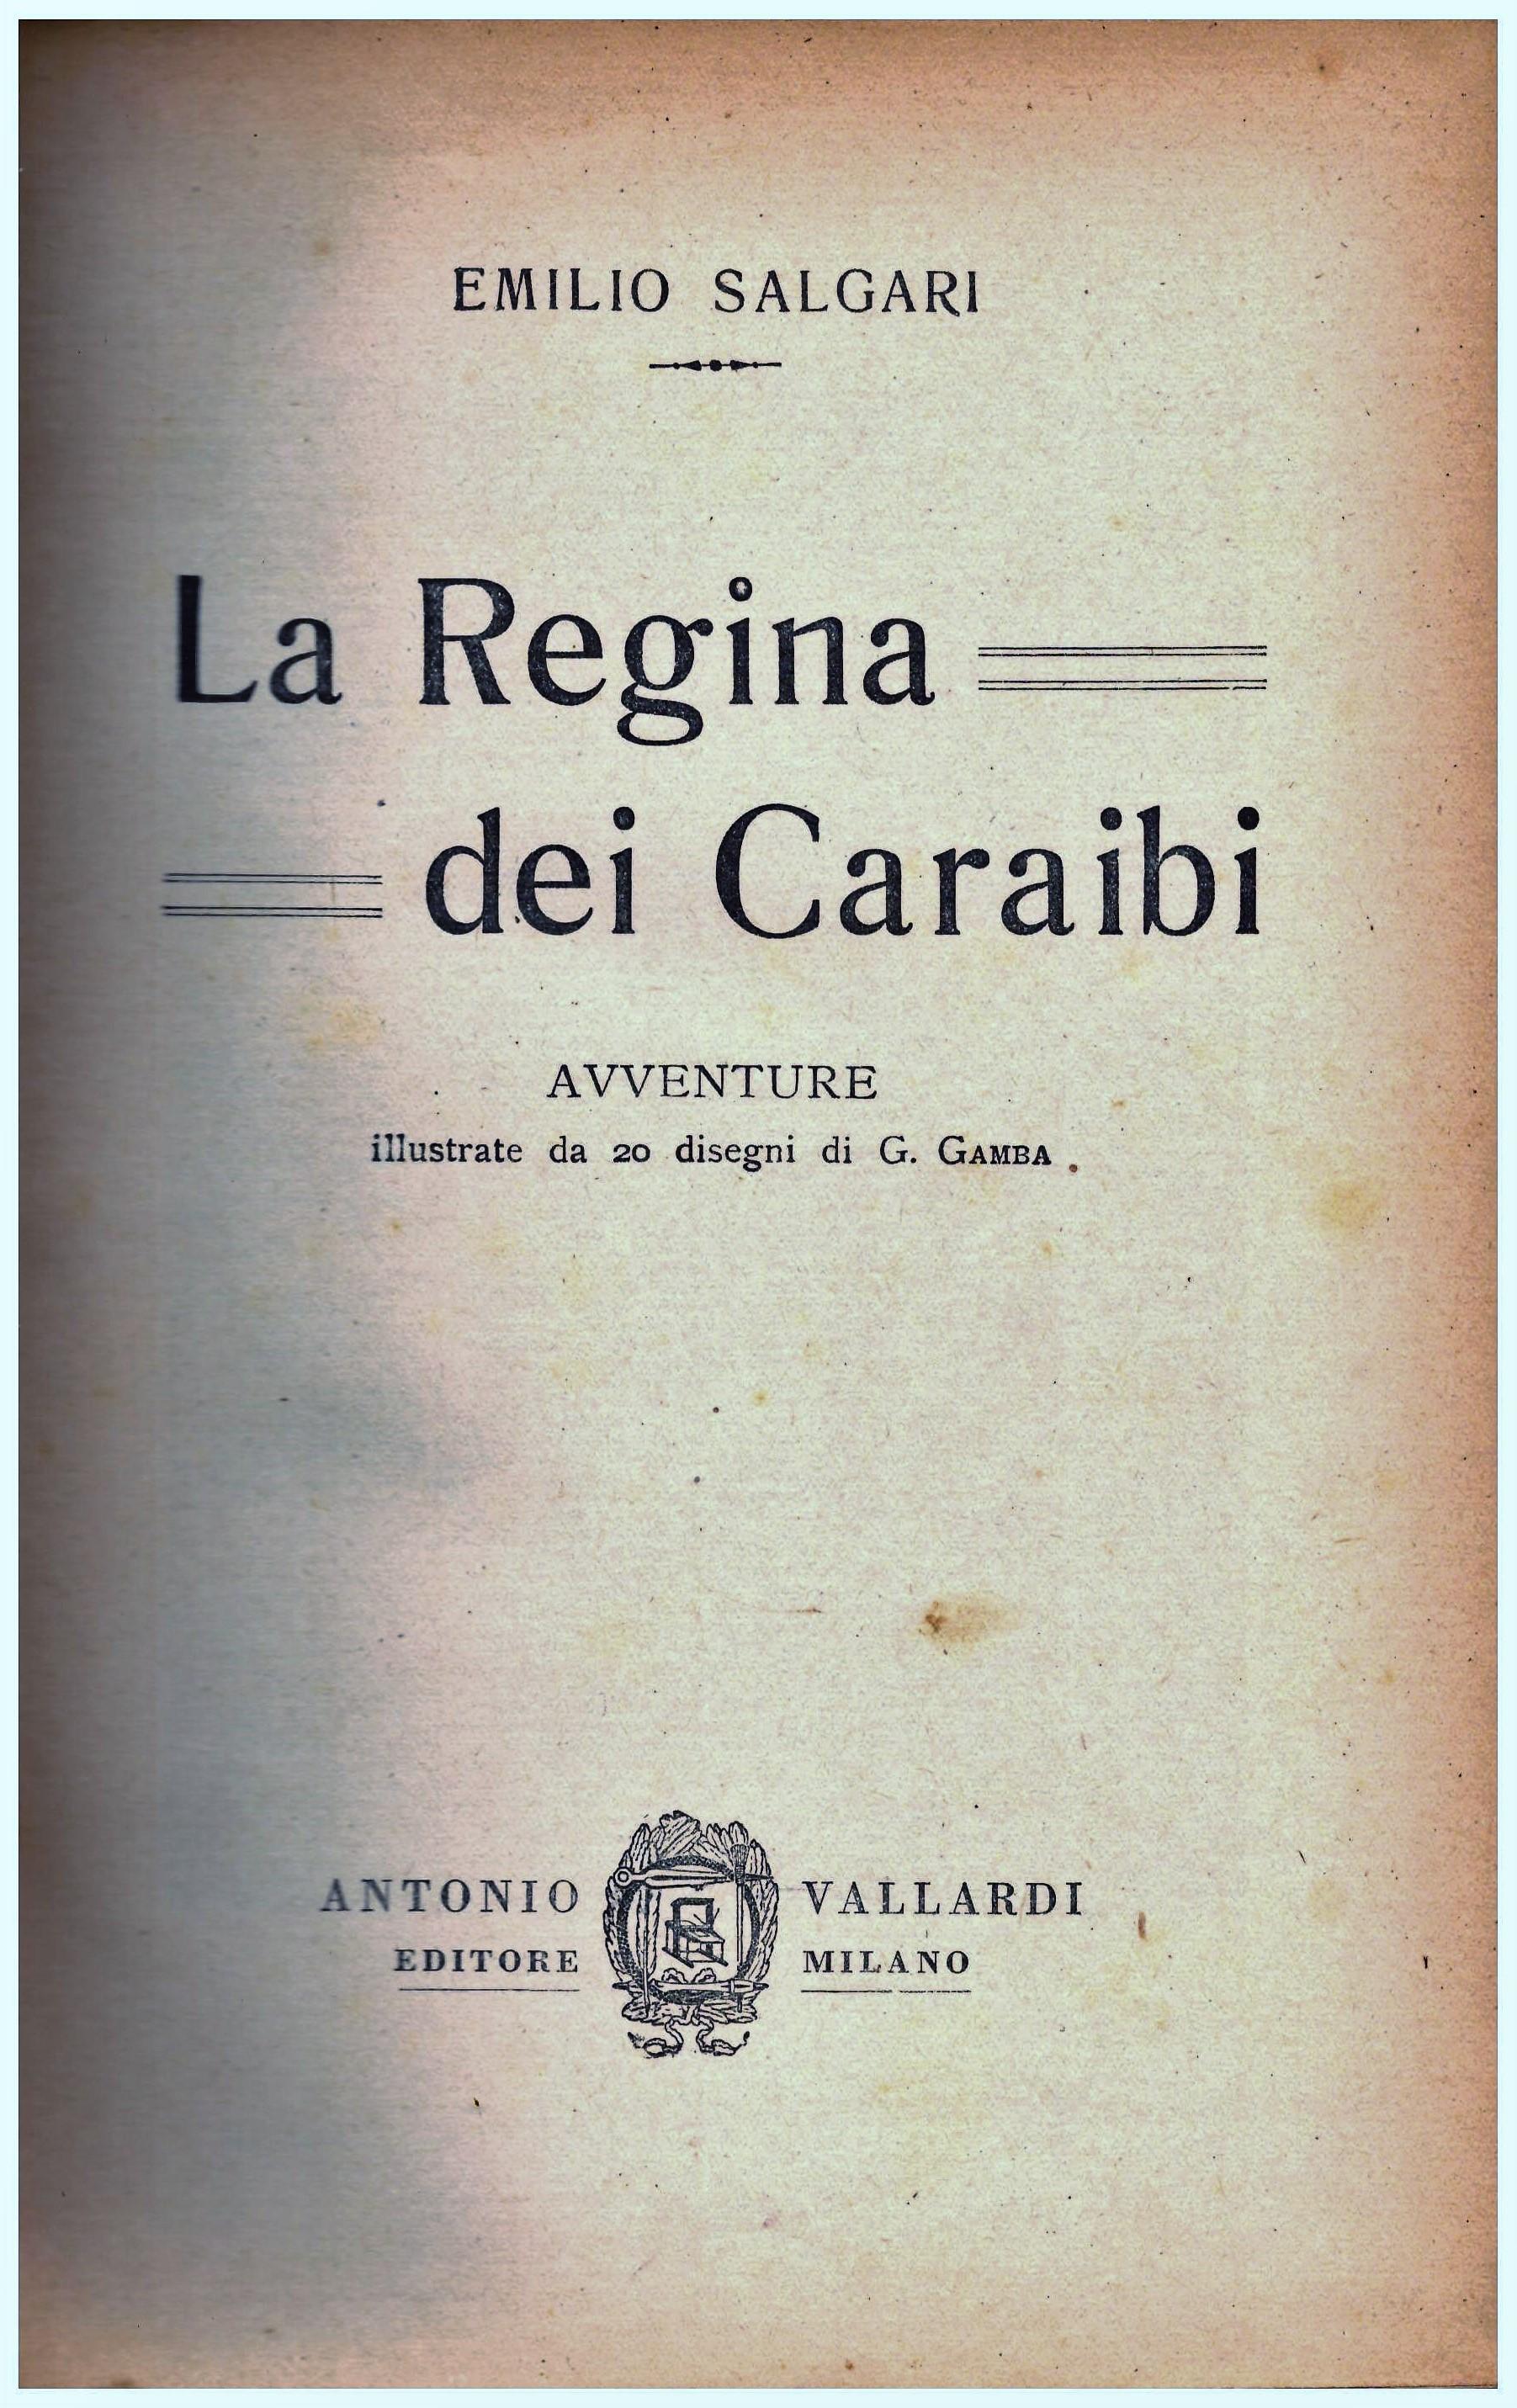 Titolo: La regina dei Caraibi Autore: Emilio Salgari  Editore: Antonio Vallardi, Milano 1931